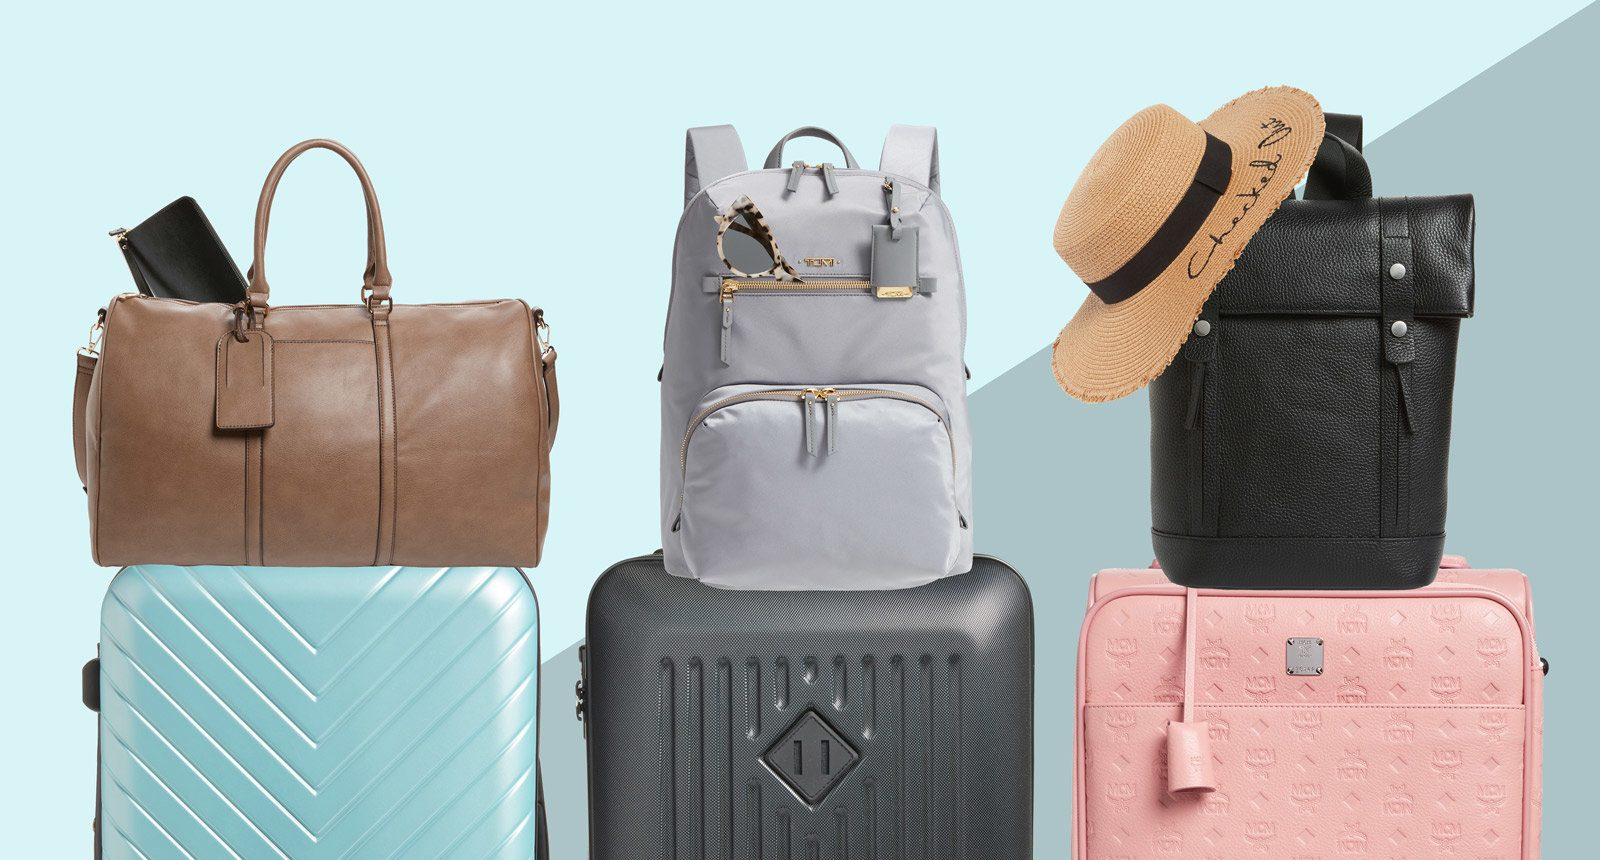 224d31405a Nordstrom Anniversary Sale 2018 Top Travel Picks - Adventures in Gourmet